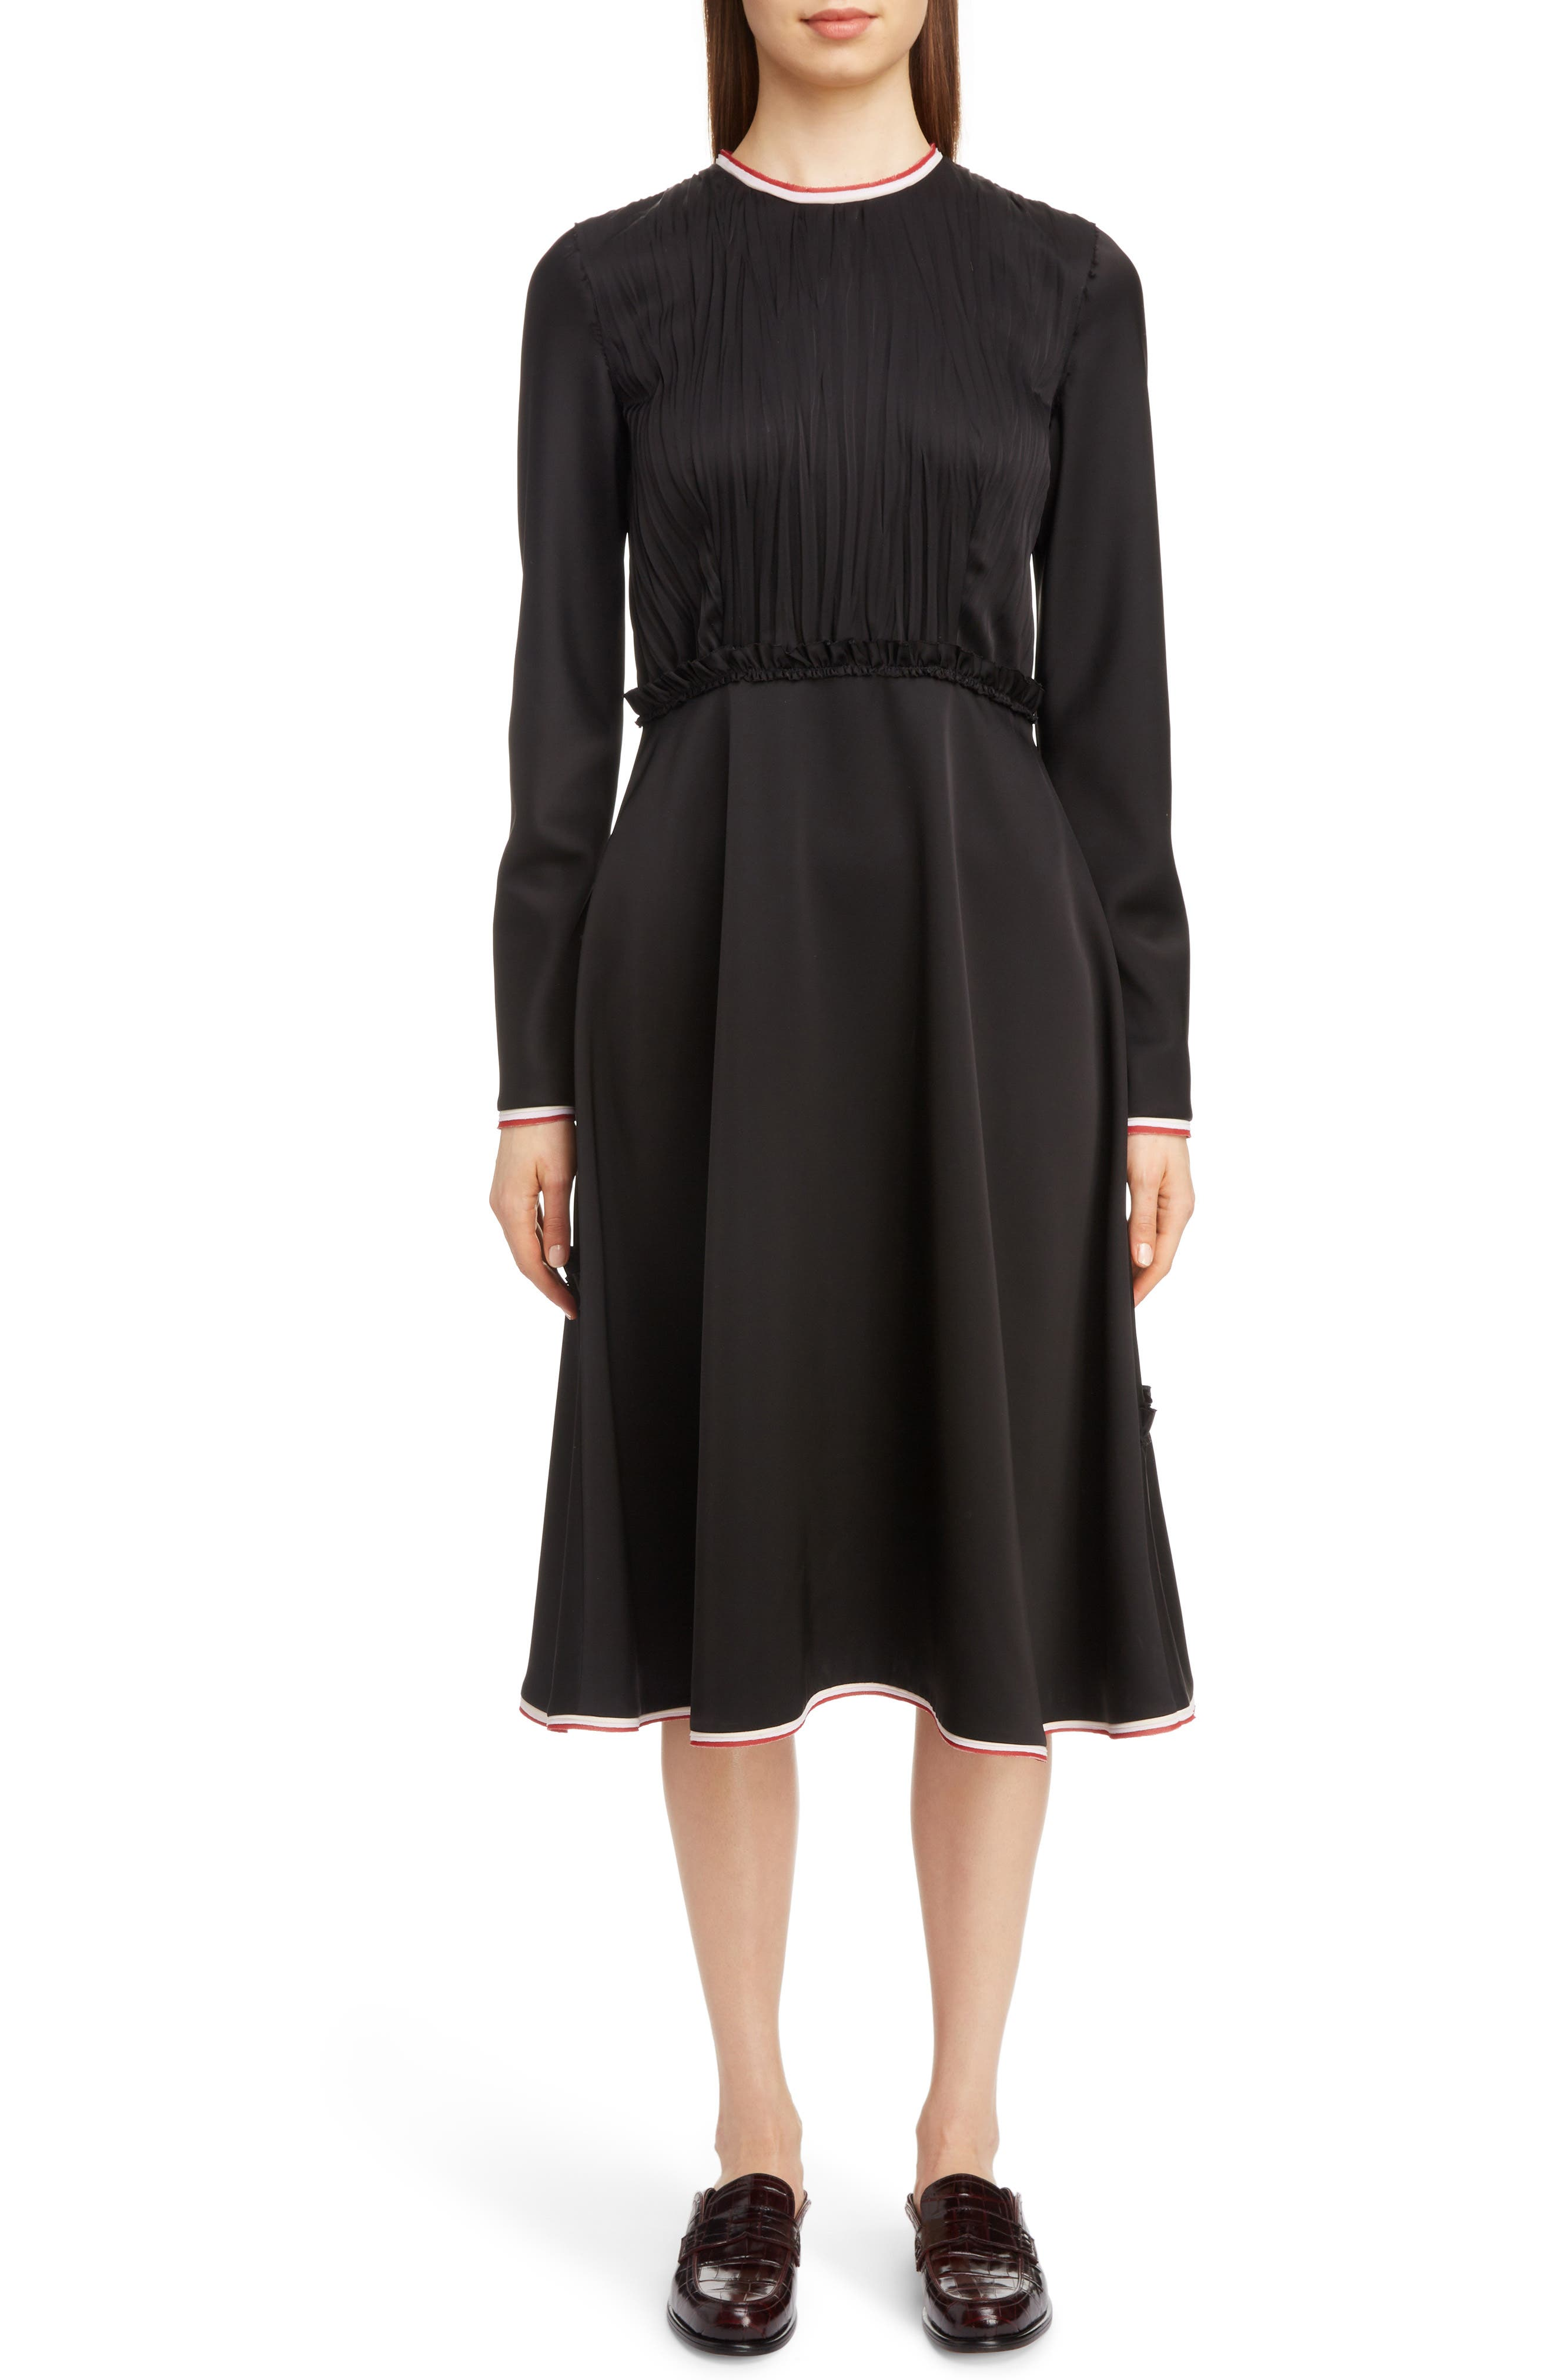 LOEWE Stripe Trim Back Cutout Dress, Main, color, 001